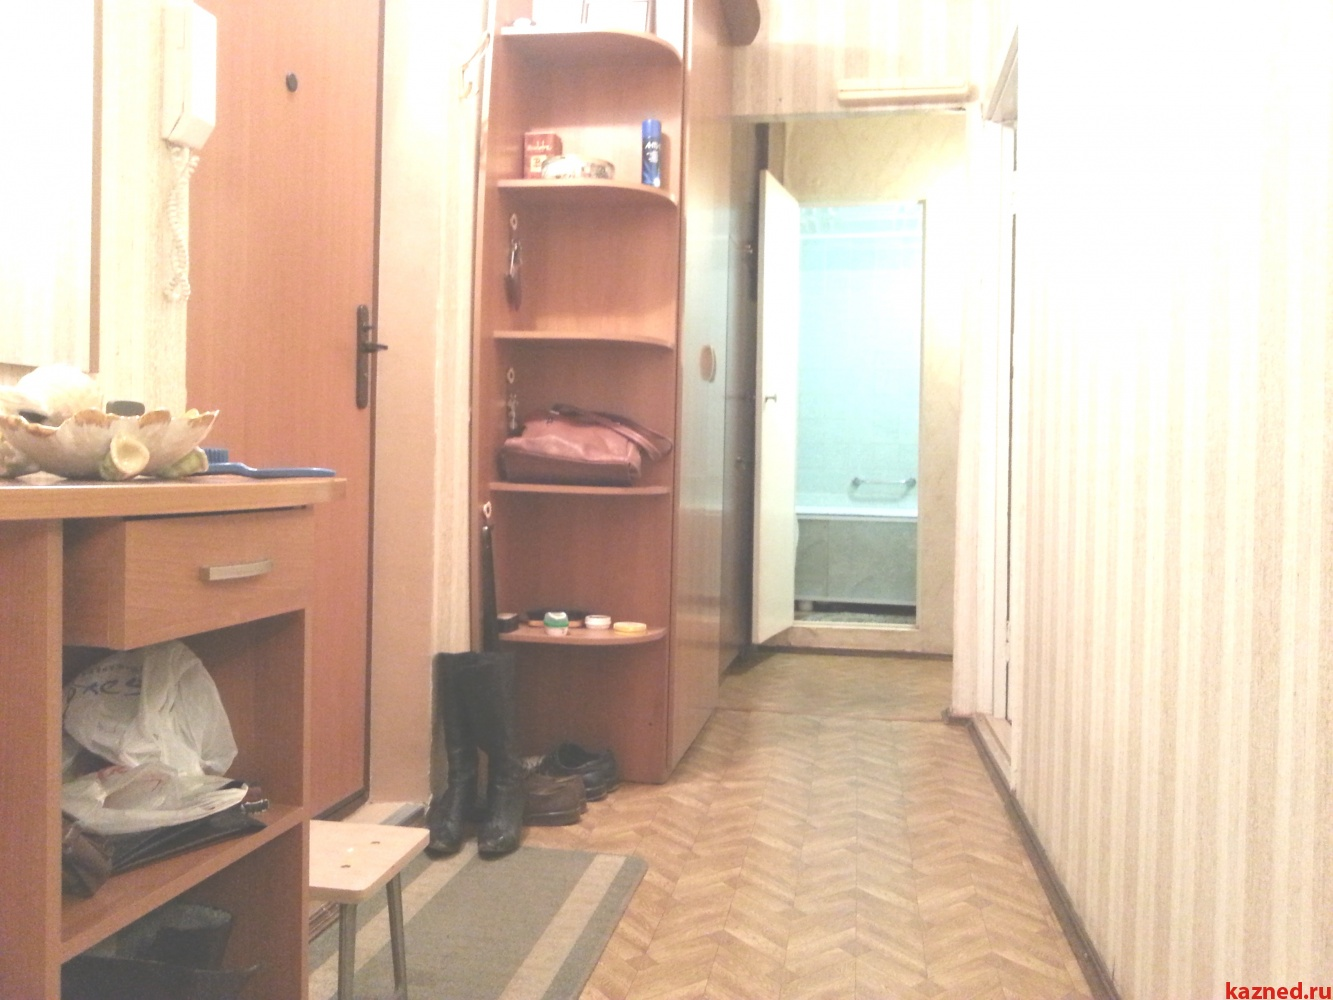 Продажа 2-к квартиры Фучика, 16, 53 м2  (миниатюра №11)